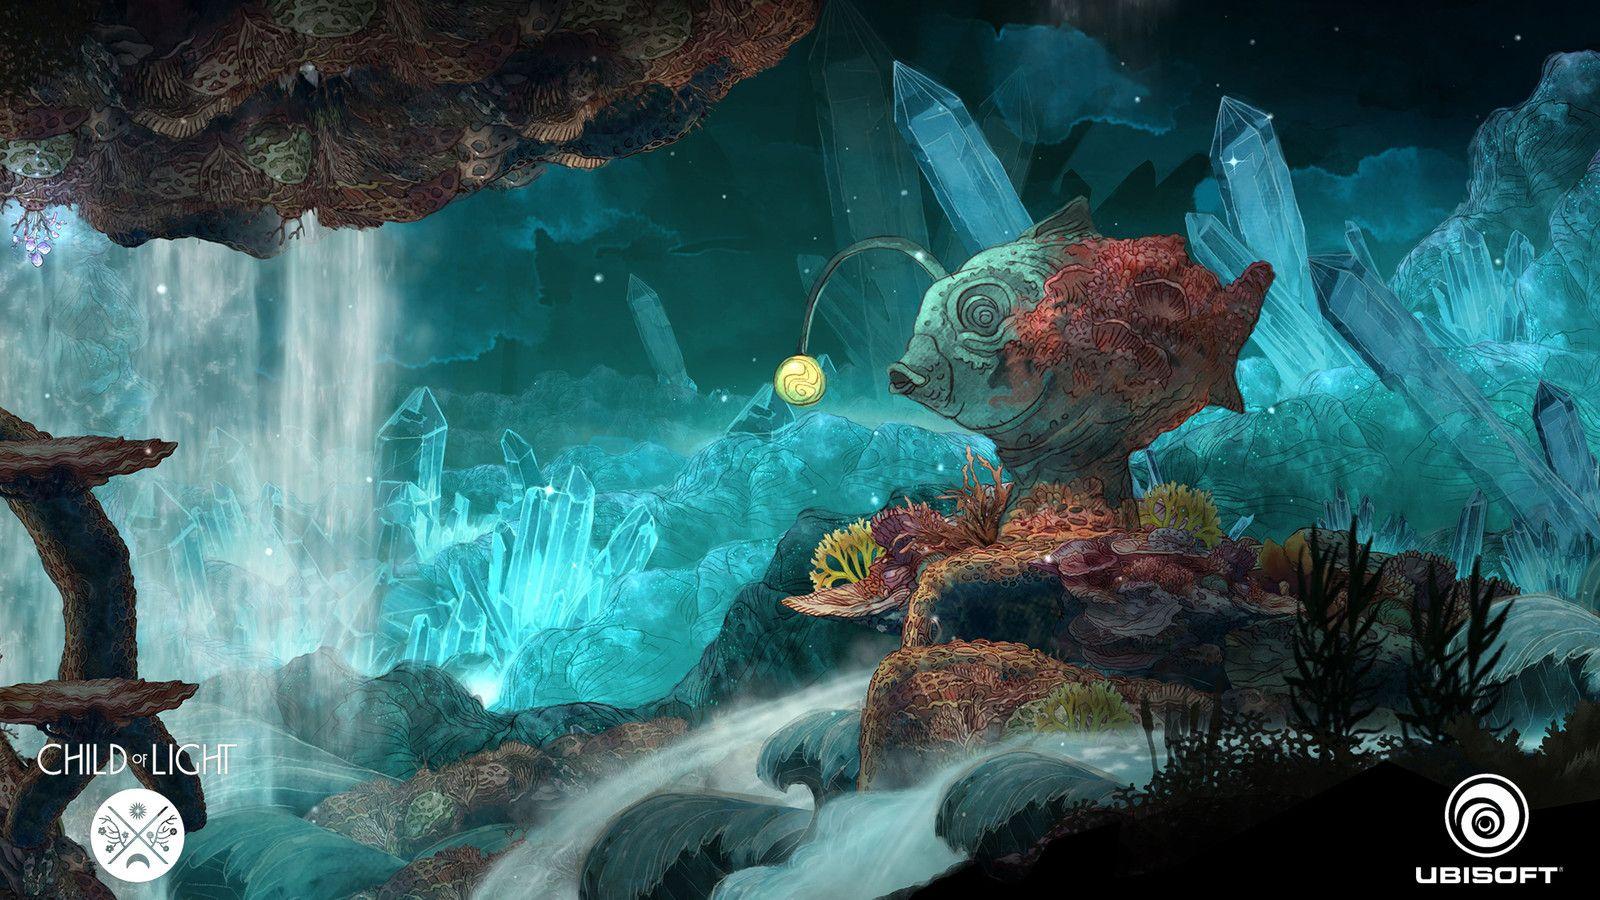 Amazing art work for the wonderful game Child Of Light - Level work, TEO YONG JIN on ArtStation at https://www.artstation.com/artwork/rzDom